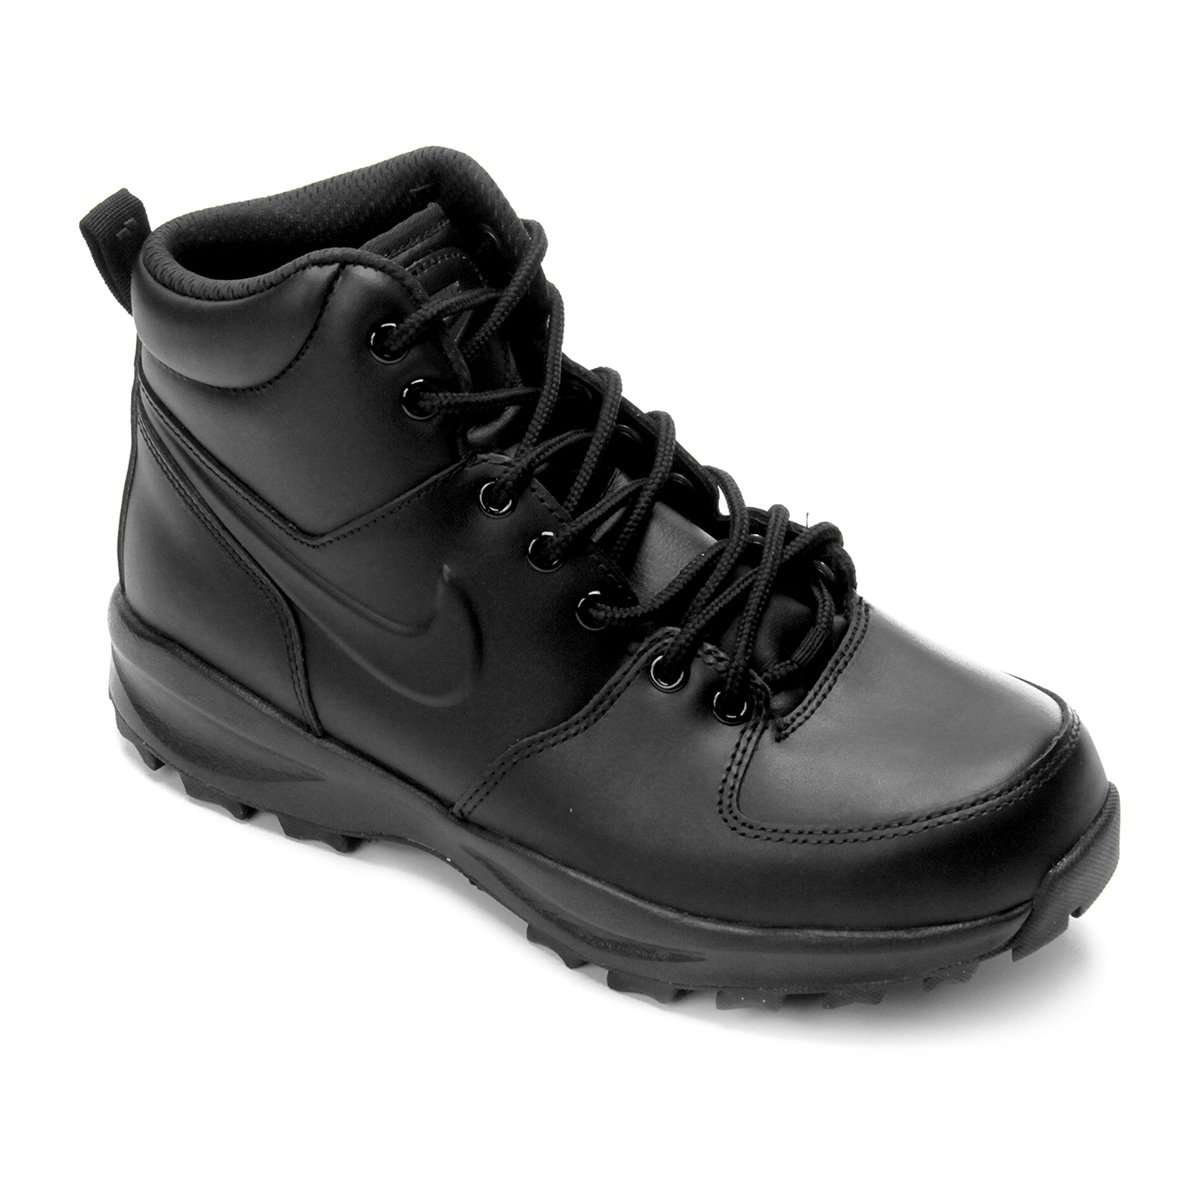 7b9eb406e0 Tênis cano alto nike manoa leather masculino compre agora netshoes jpg  1200x1200 Nike bota preta masculina